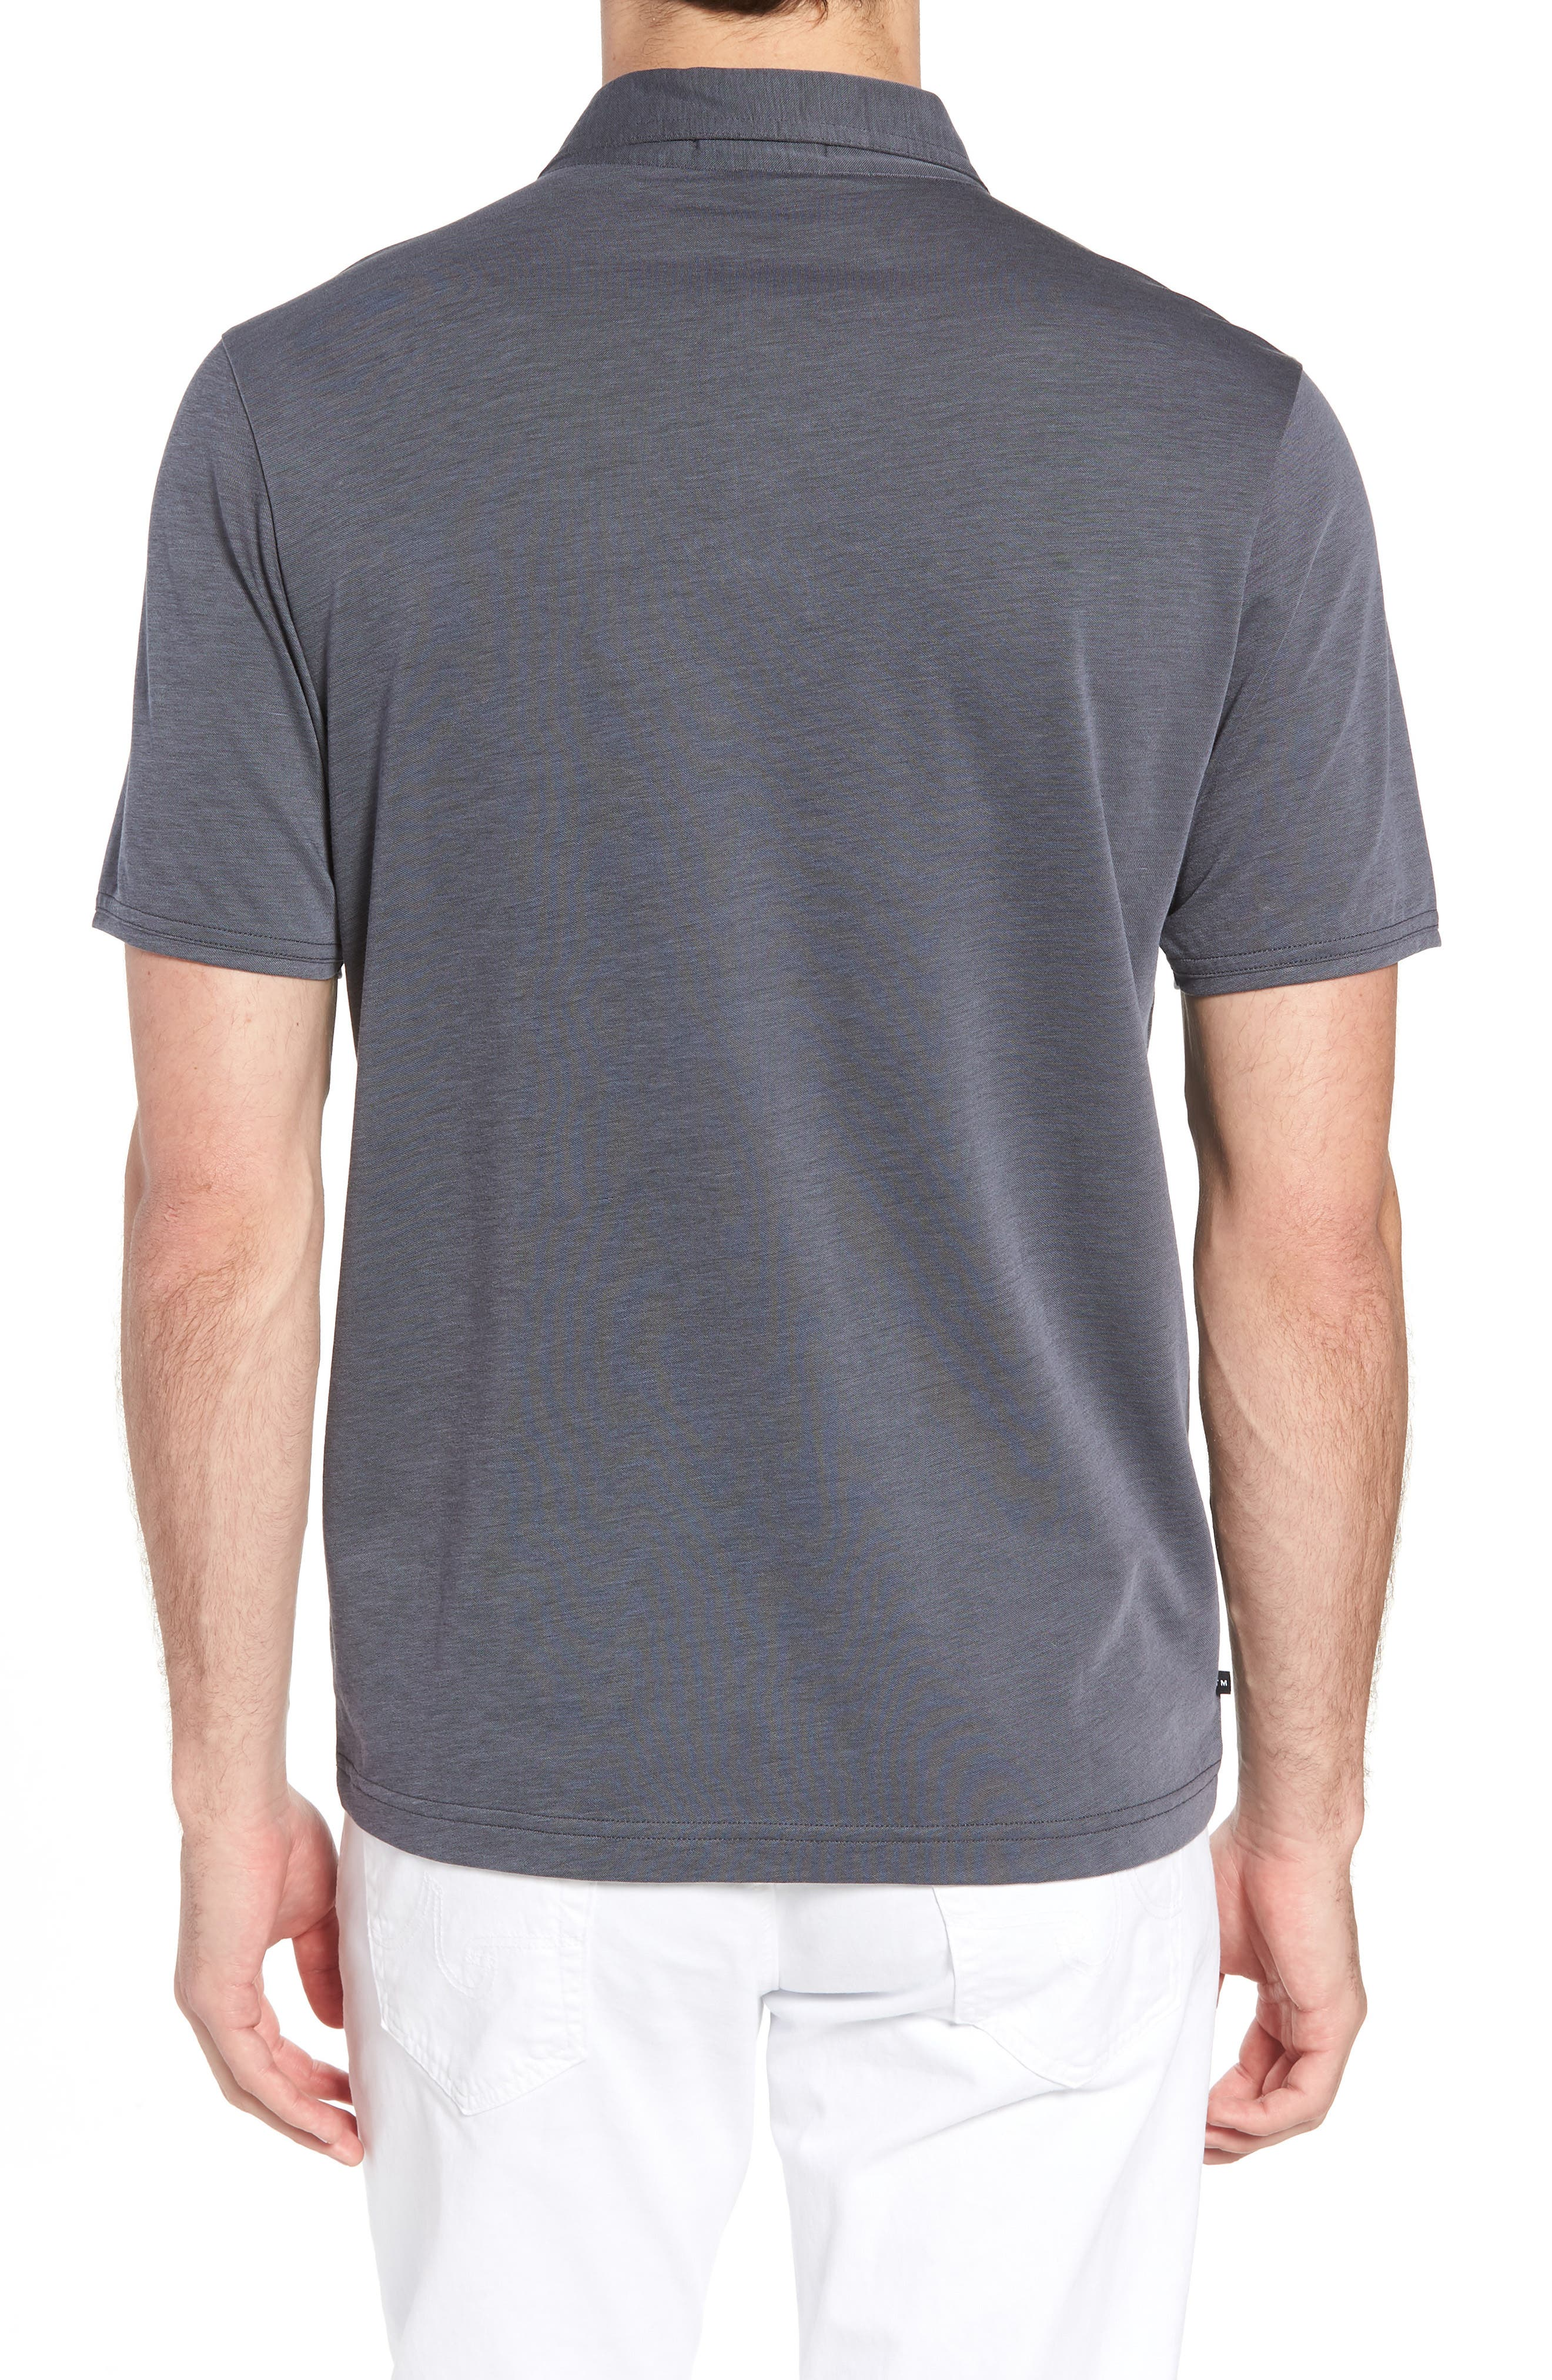 Shalene Regular Fit Polo,                             Alternate thumbnail 2, color,                             Grisaille/ Black